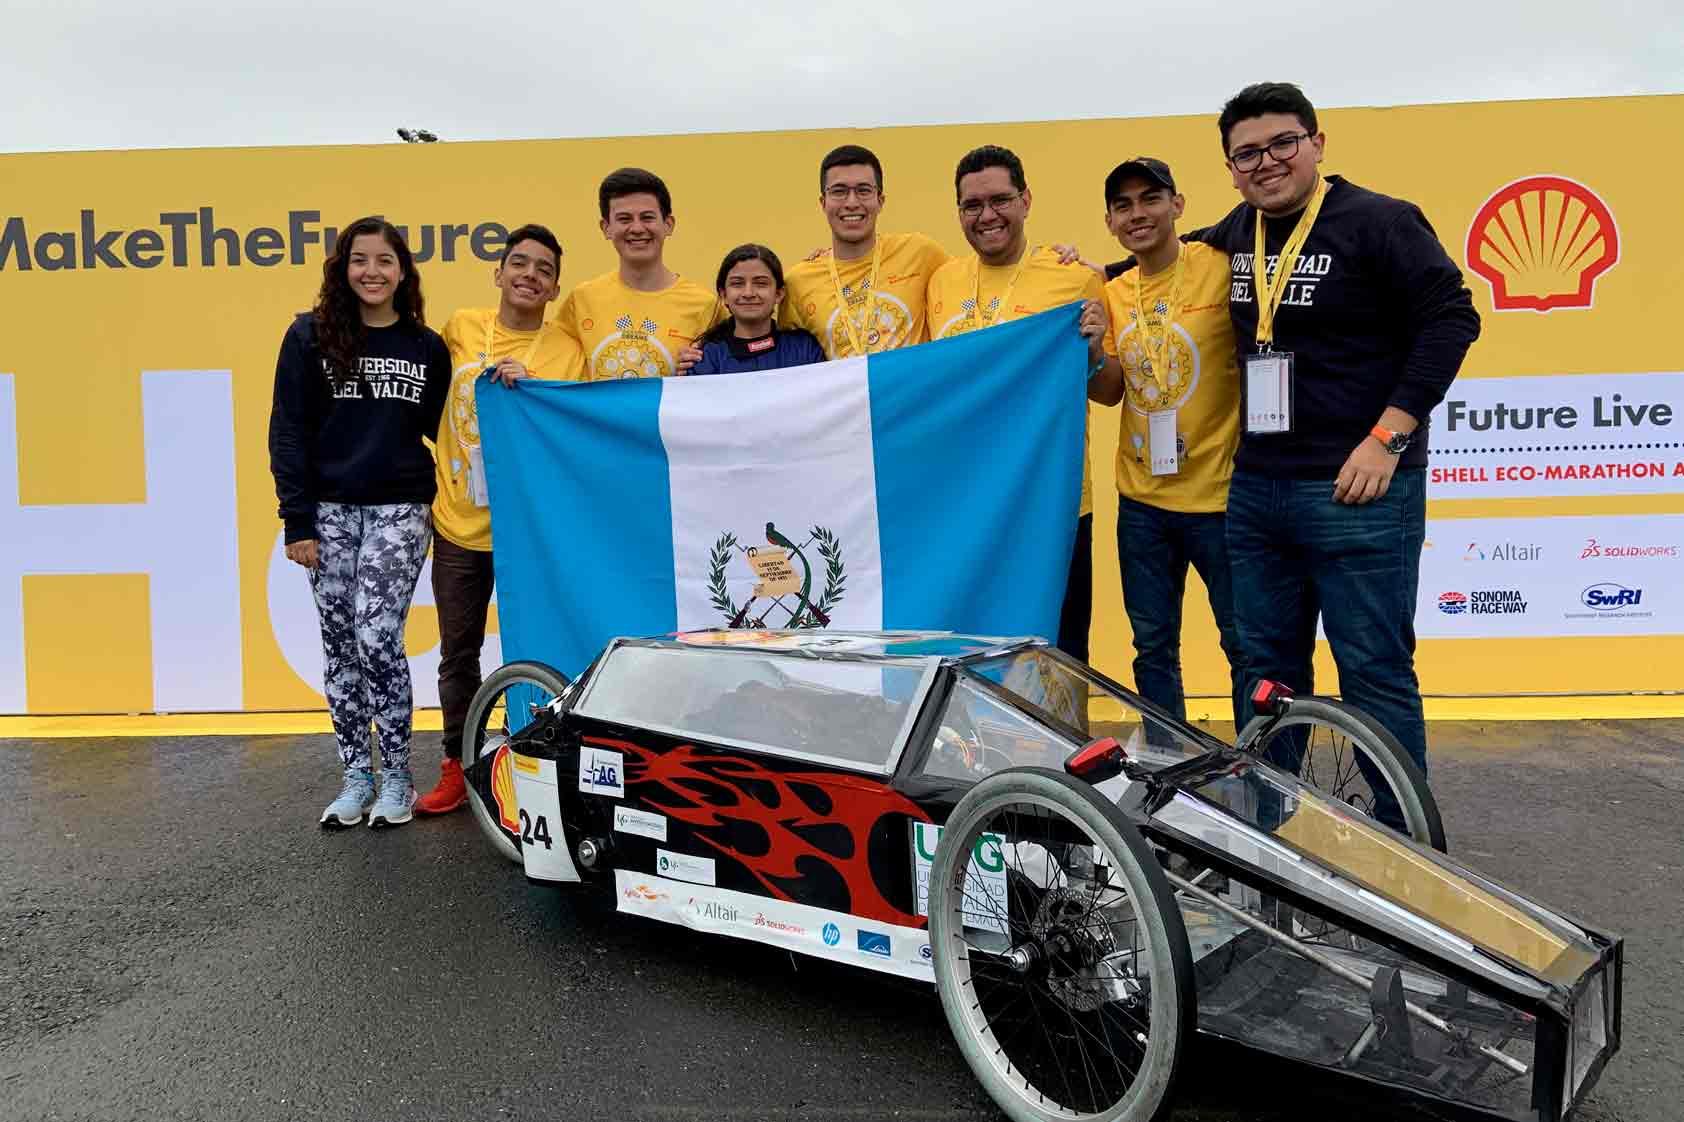 Shell Eco-Marathon ¡UVG representó a Centroamérica!